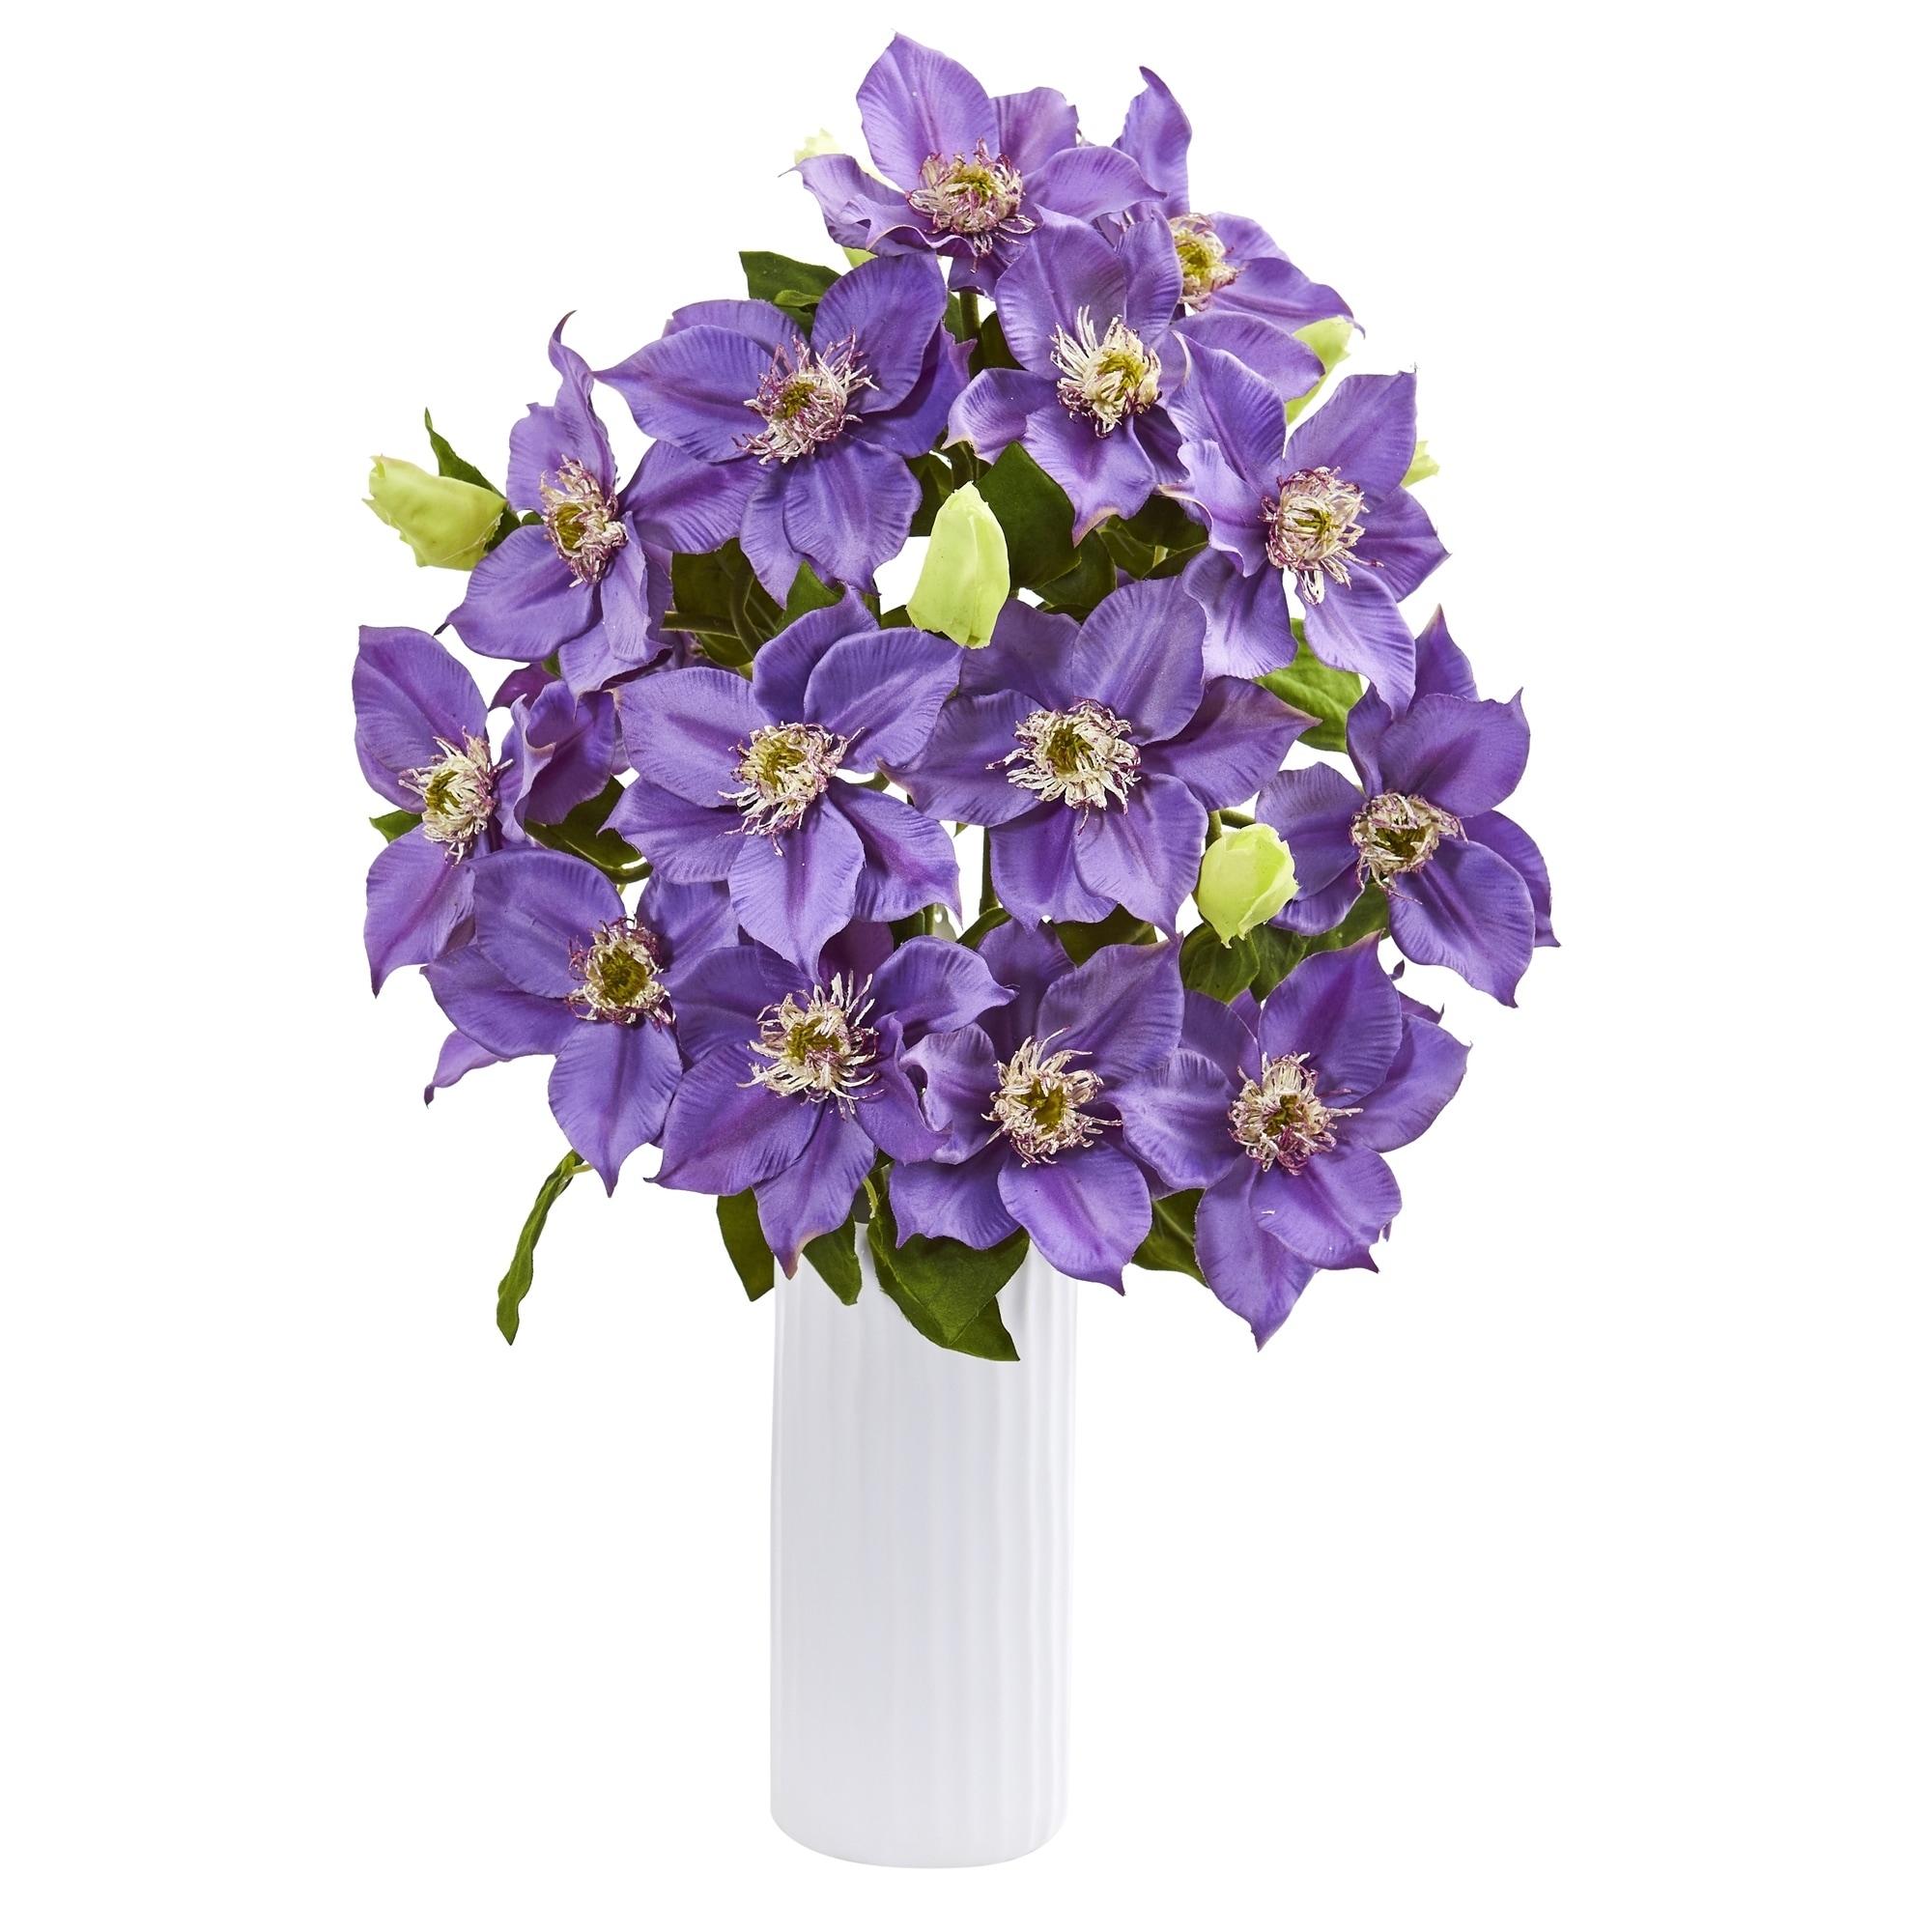 21 Anemone Artificial Arrangement in White Vase